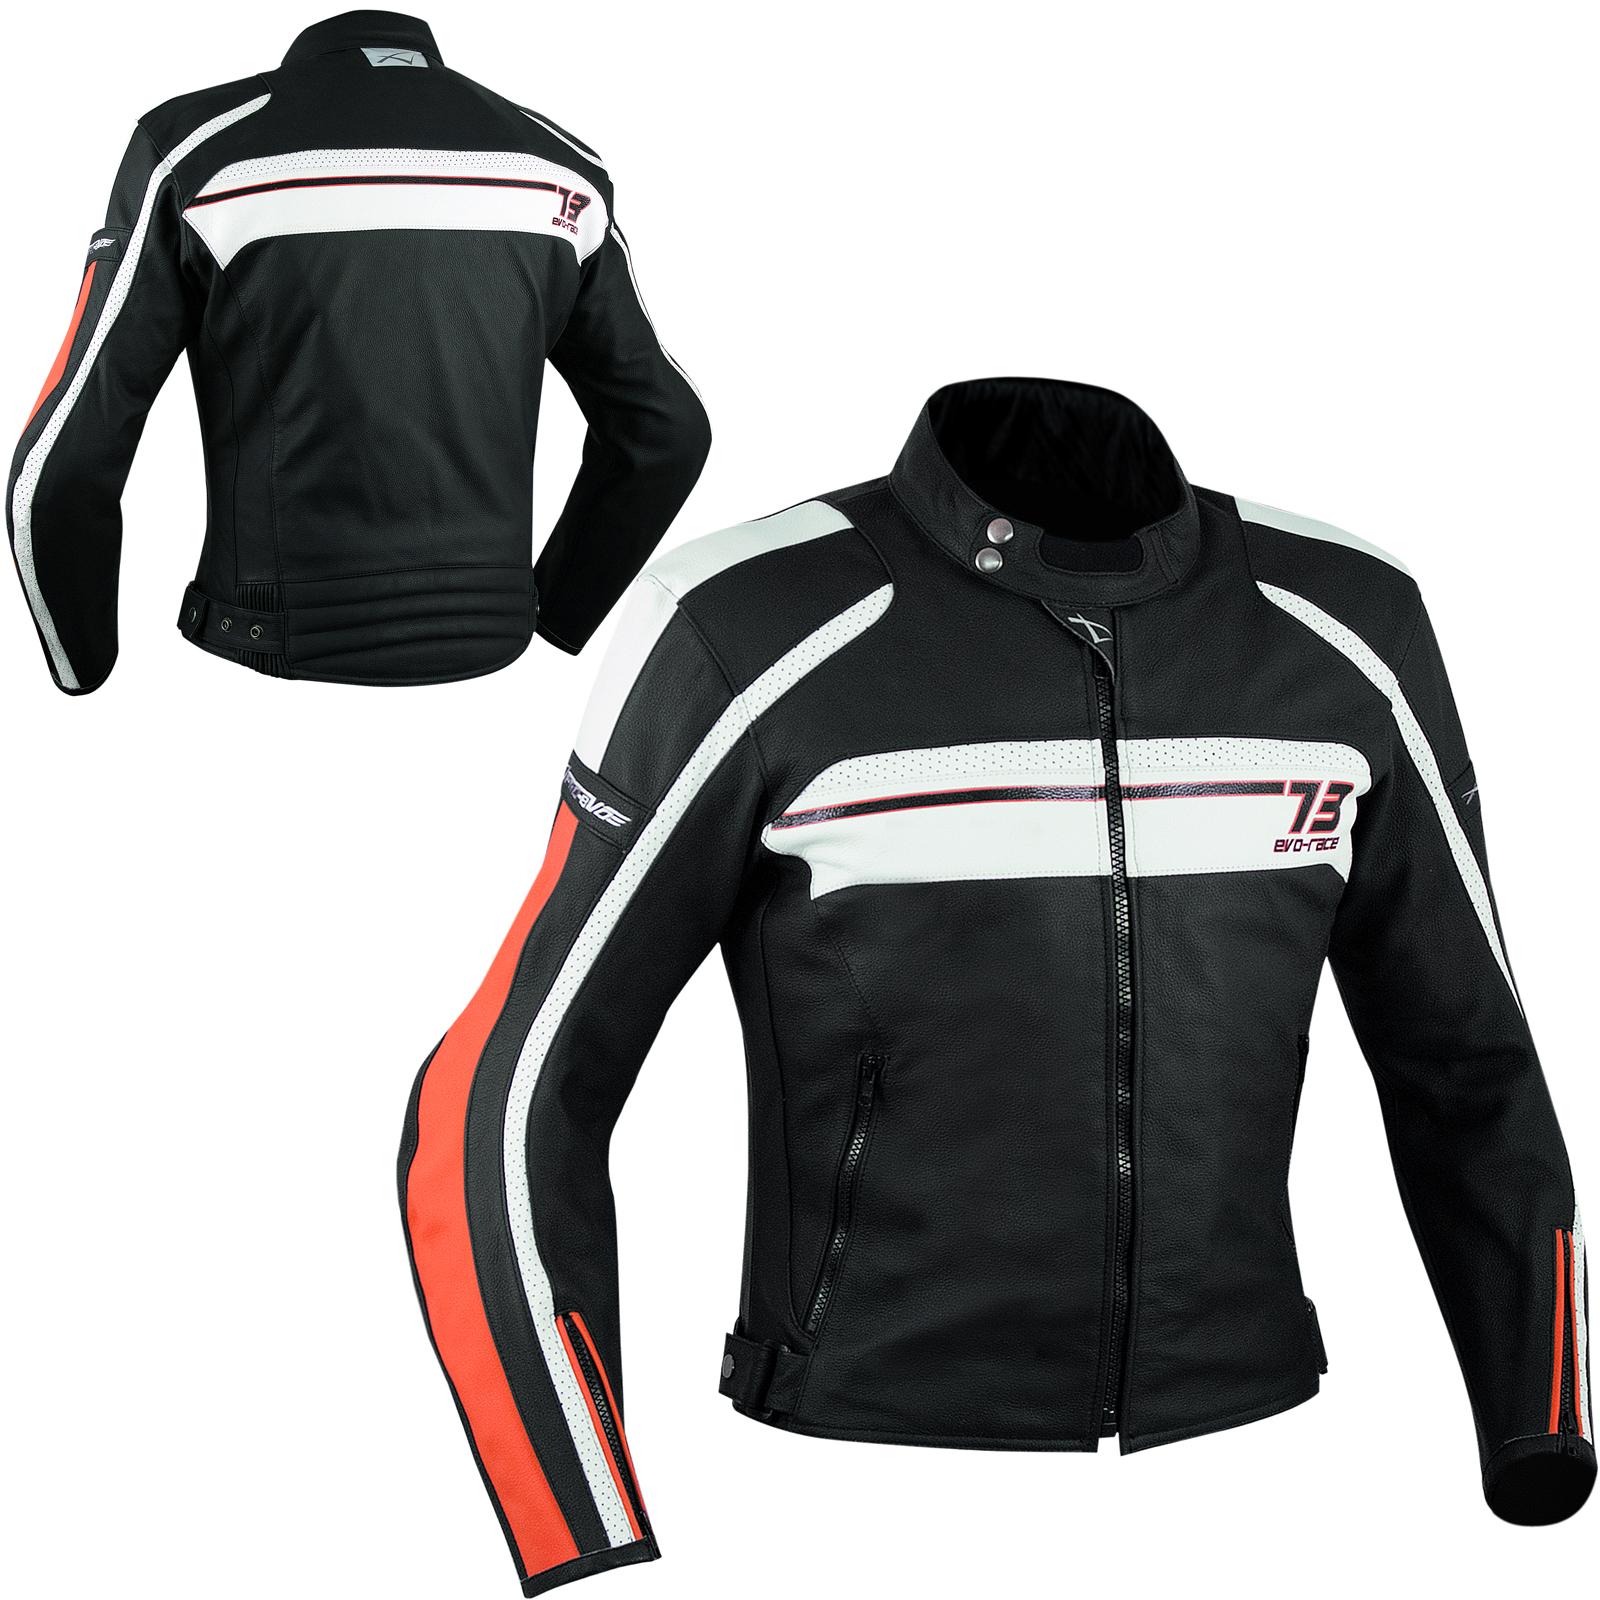 Naked-Sport-Moto-Chaqueta-Piel-Protecciones-CE-KTM-YAMAHA-HONDA-Orange